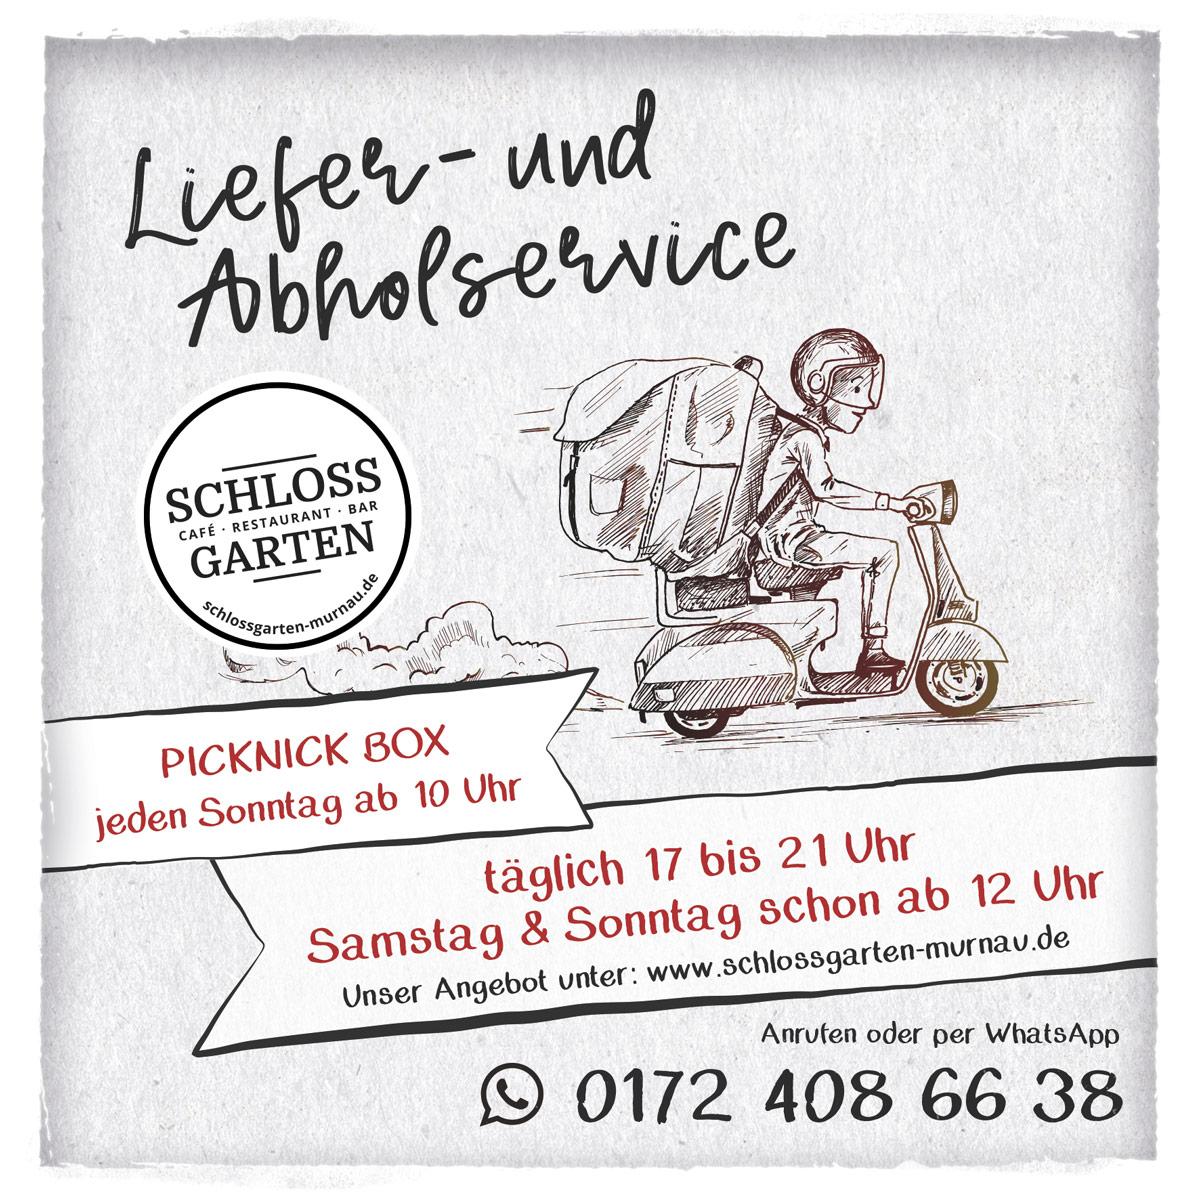 Schlossgarten_Lieferservice_v3_2021_Flyer_lay1